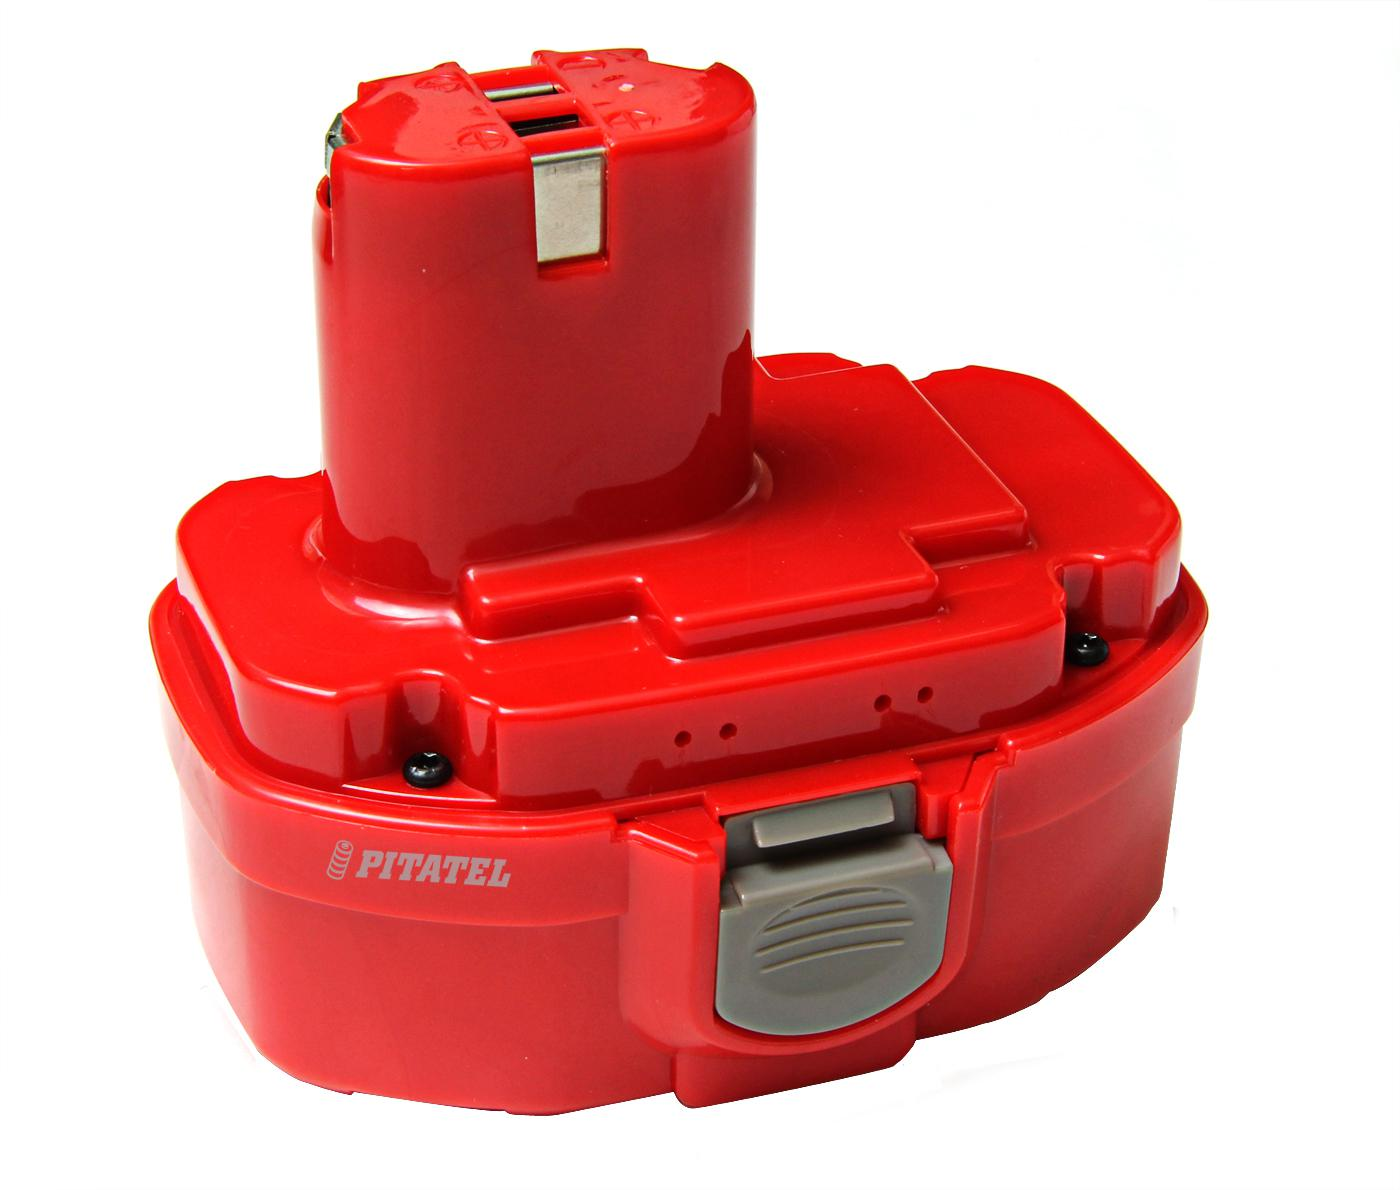 Аккумулятор Pitatel Tsb-033-mak18a-21m аккумулятор pitatel tsb 056 de12 bd12a 21m